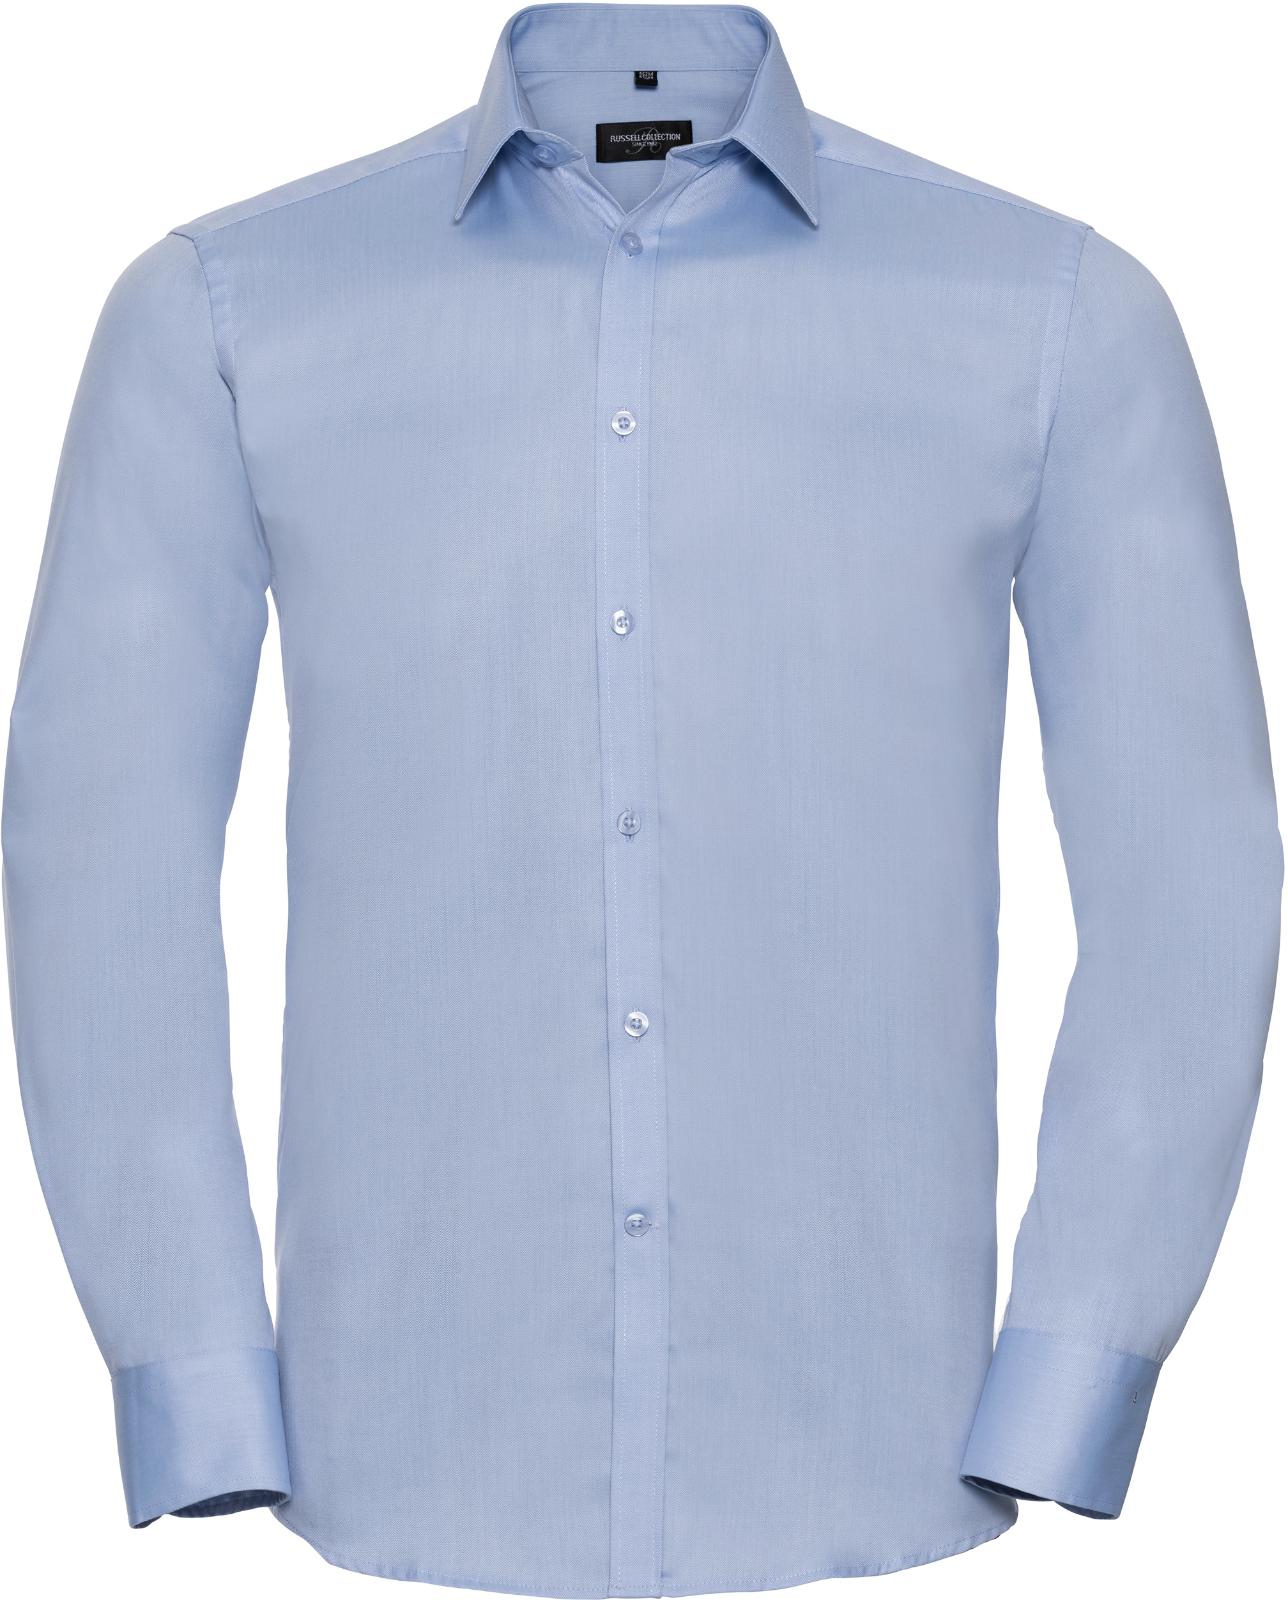 Hemd Anzug Hemden Herren Herringbone Hemd Langarm